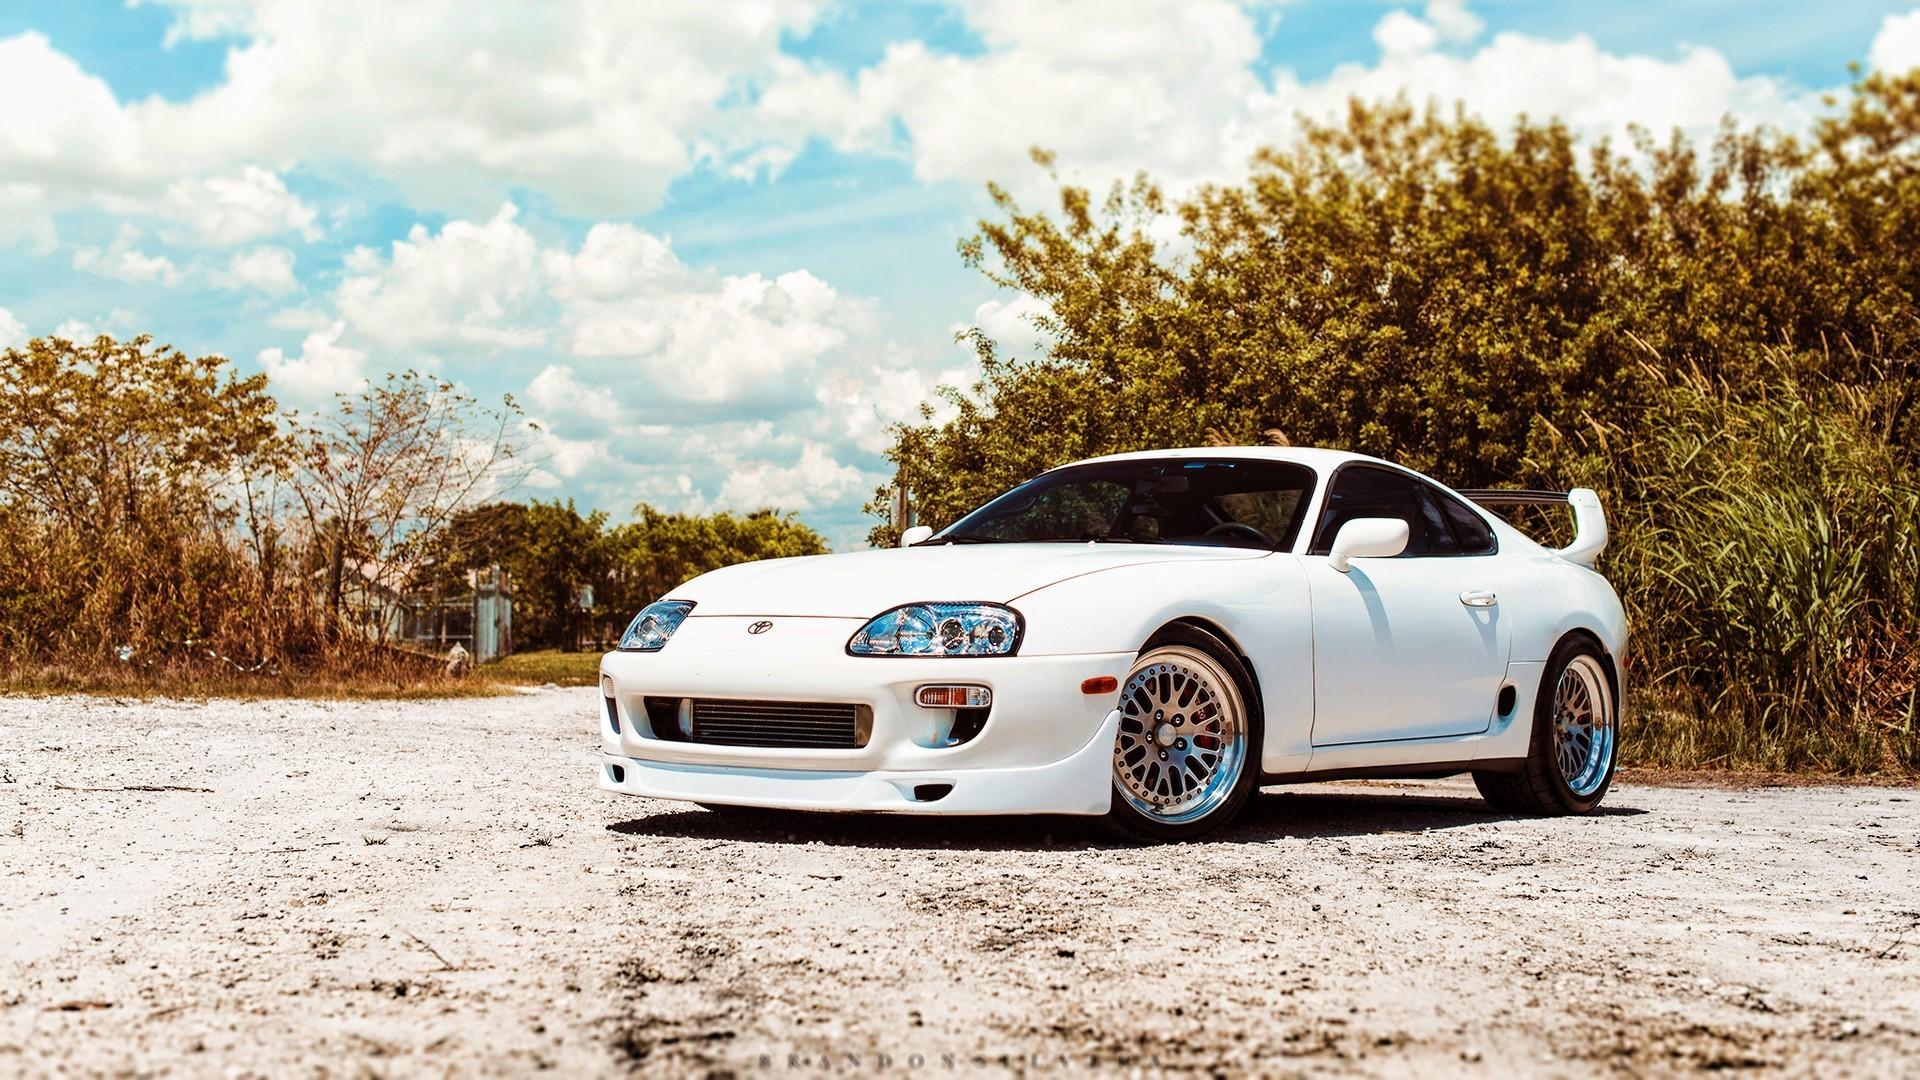 2048x1536 Toyota Supra Wallpaper